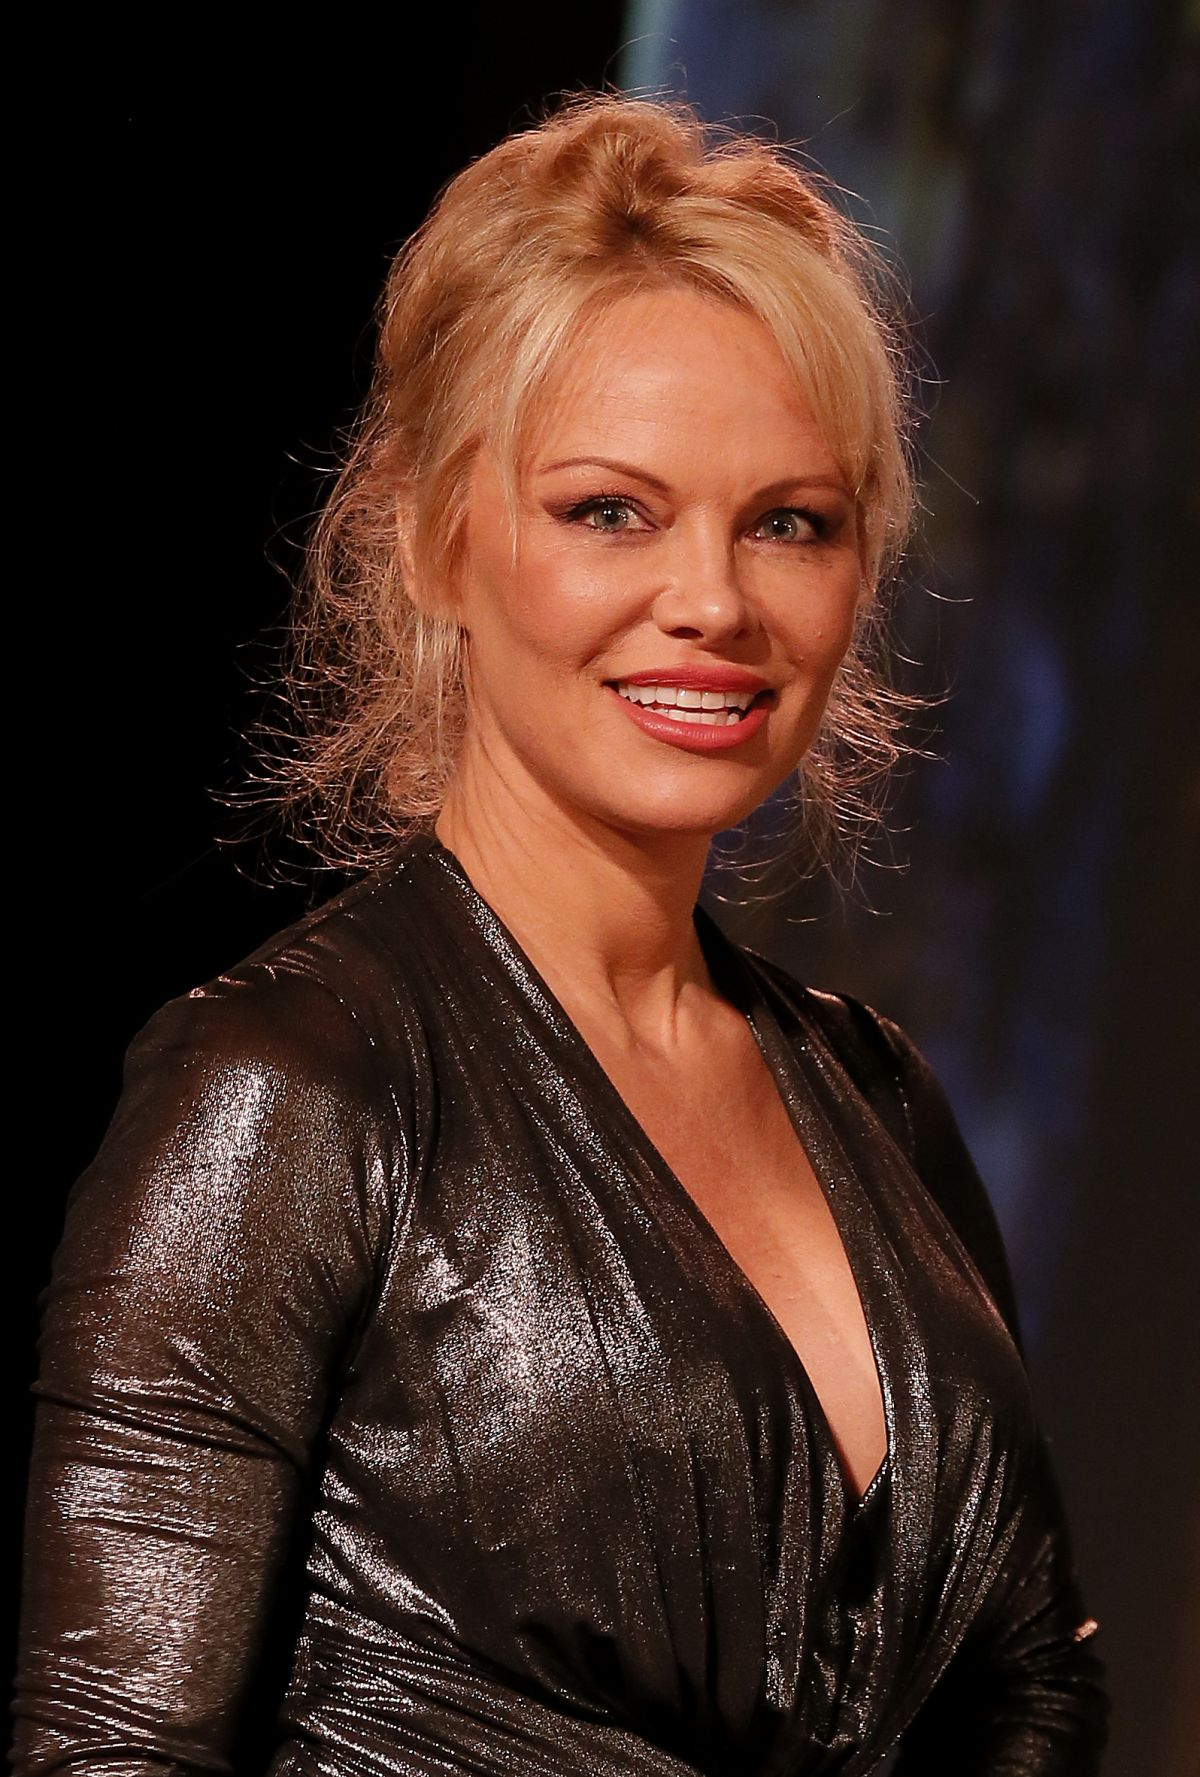 PAMELA ANDERSON at Sea Shepard 40th Anniversary in ... Pamela Anderson